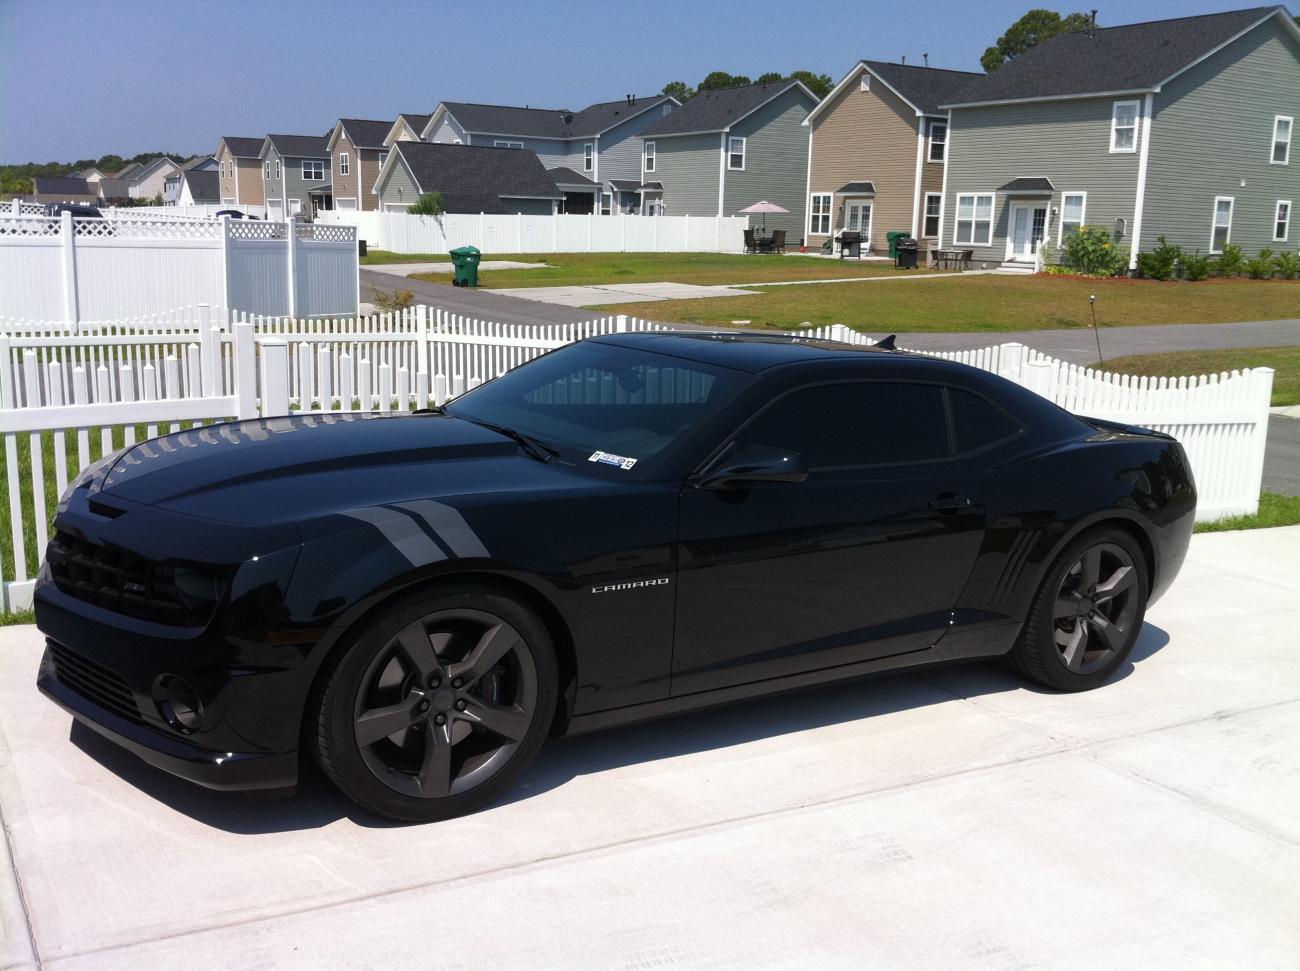 Does anybody have any good ideas for 2011 camaro ss rims camaro5 chevy camaro forum camaro zl1 ss and v6 forums camaro5 com